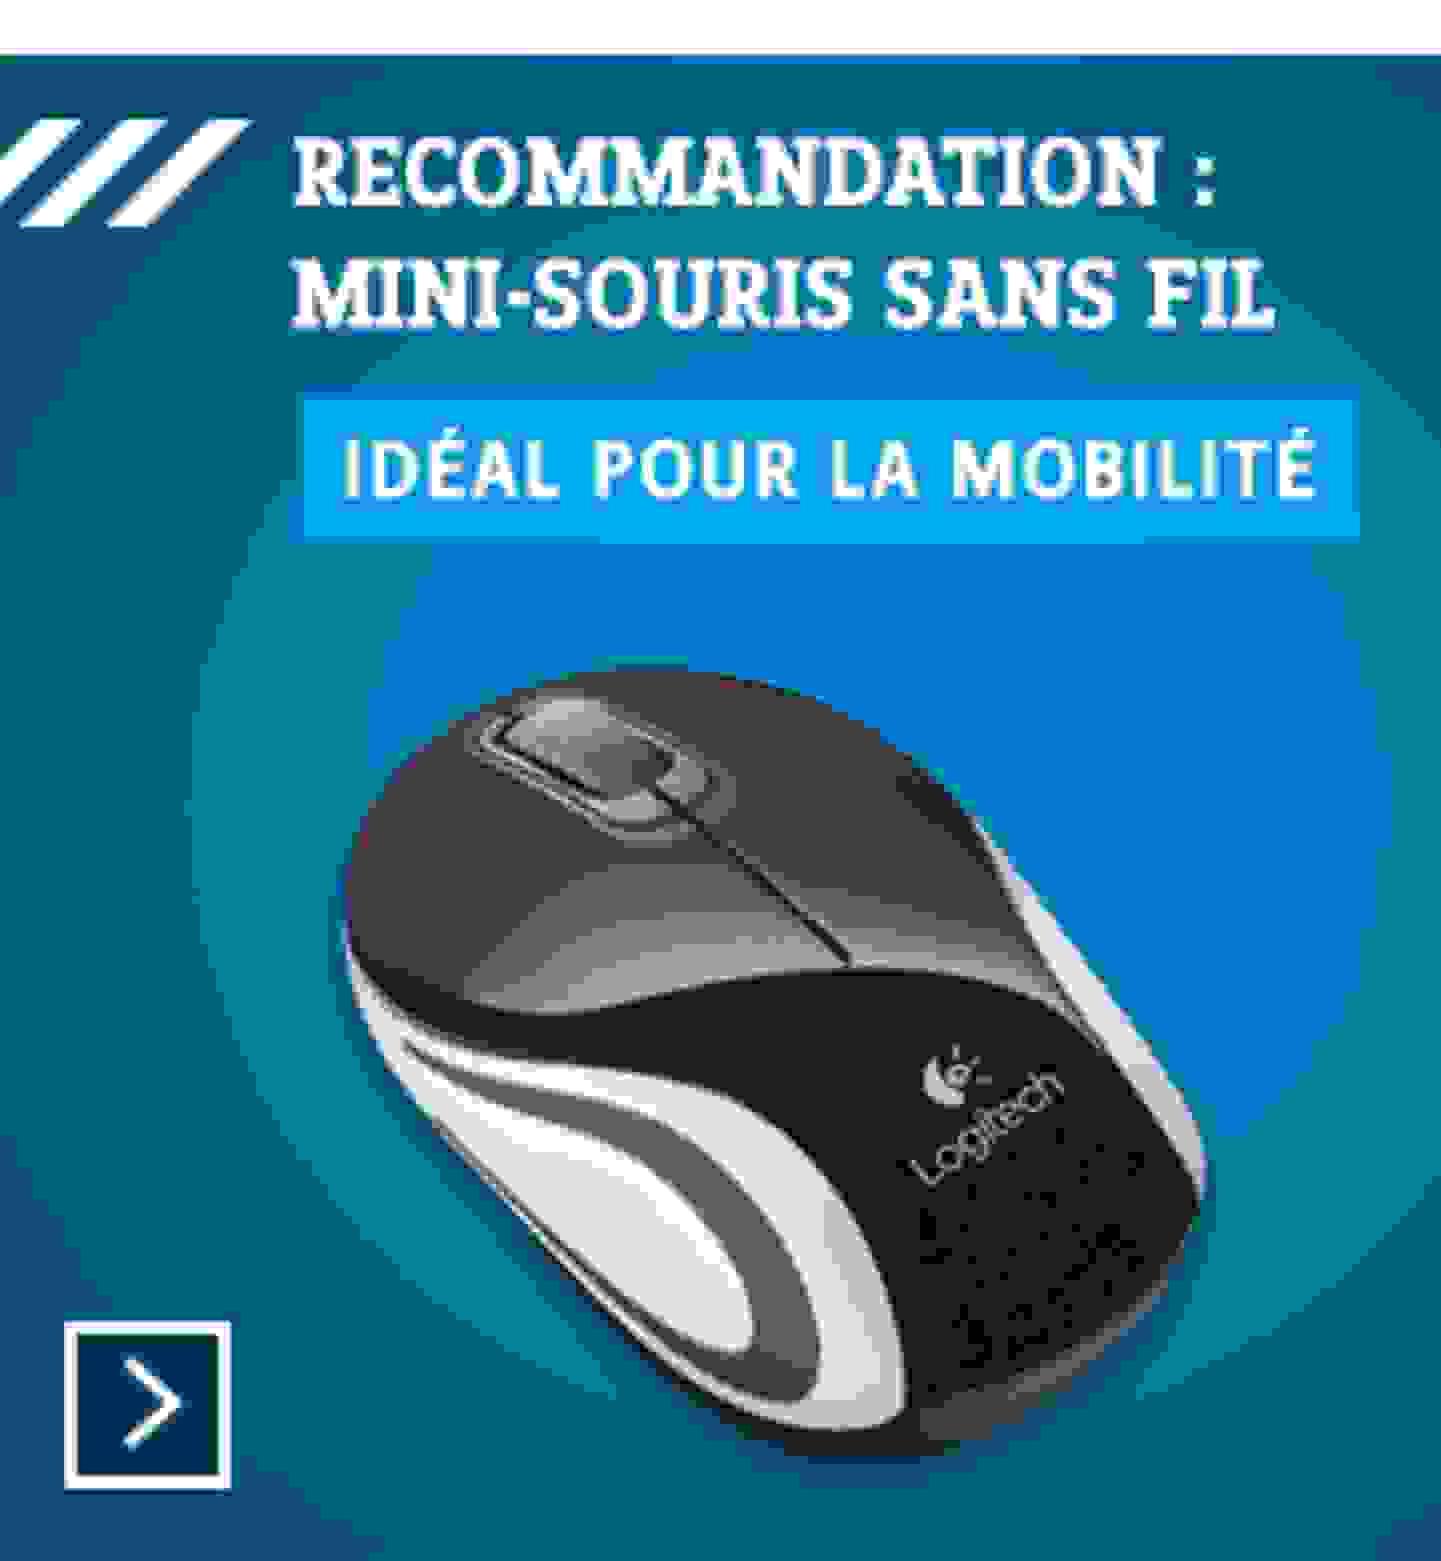 Logitech - Mini-souris sans fil